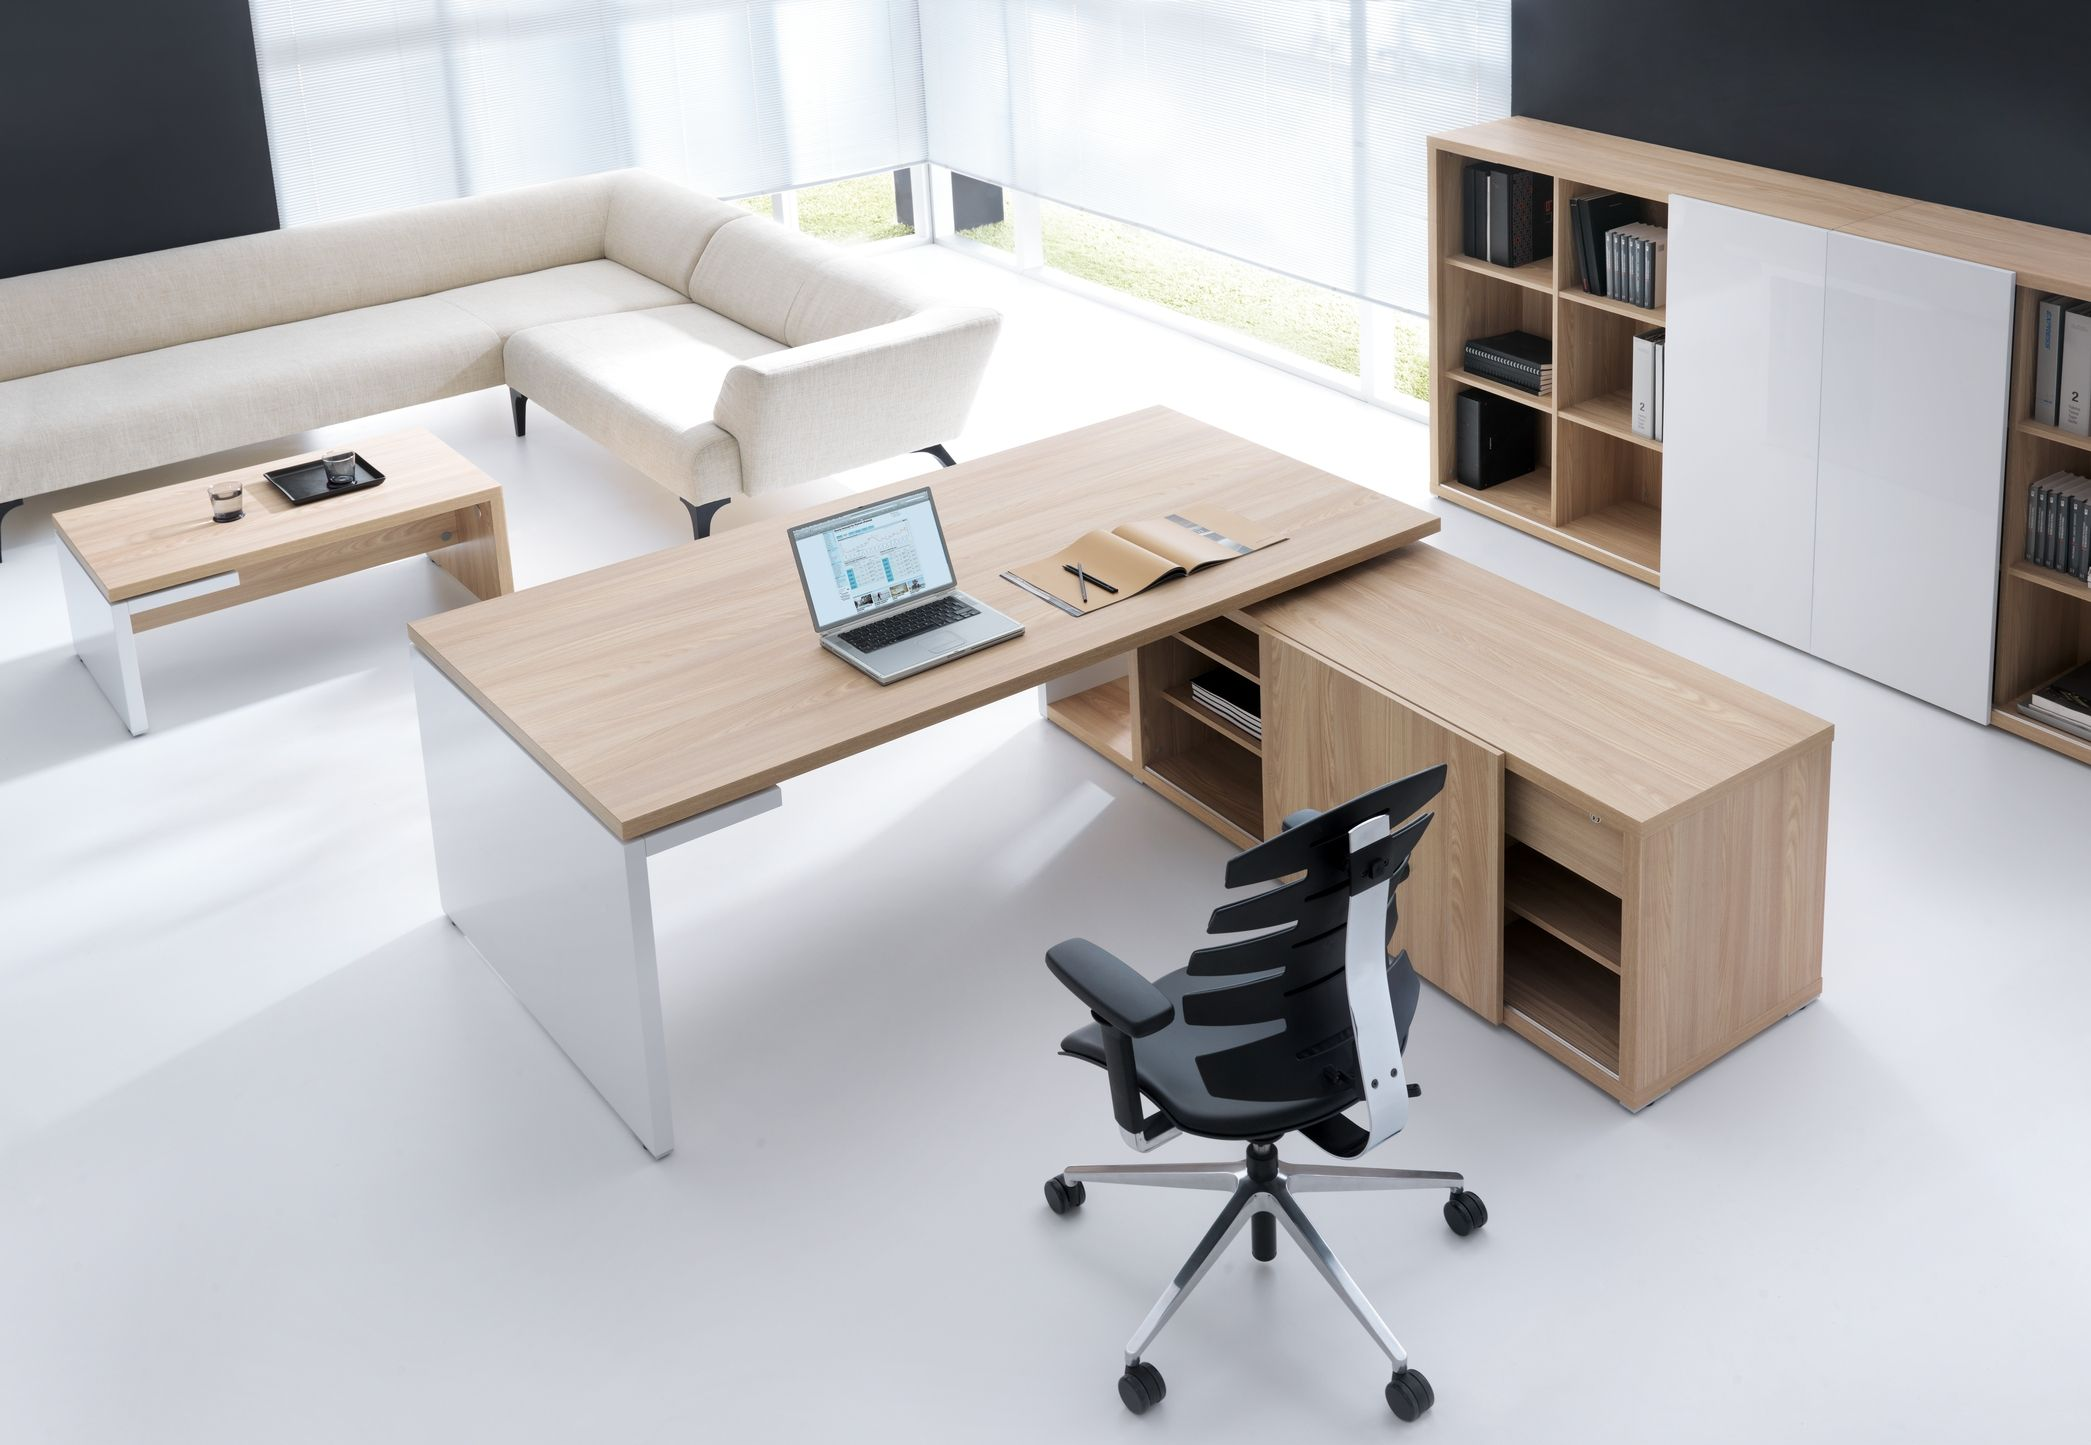 Chefzimmer, Büromöbel, Design Büroeinrichtung